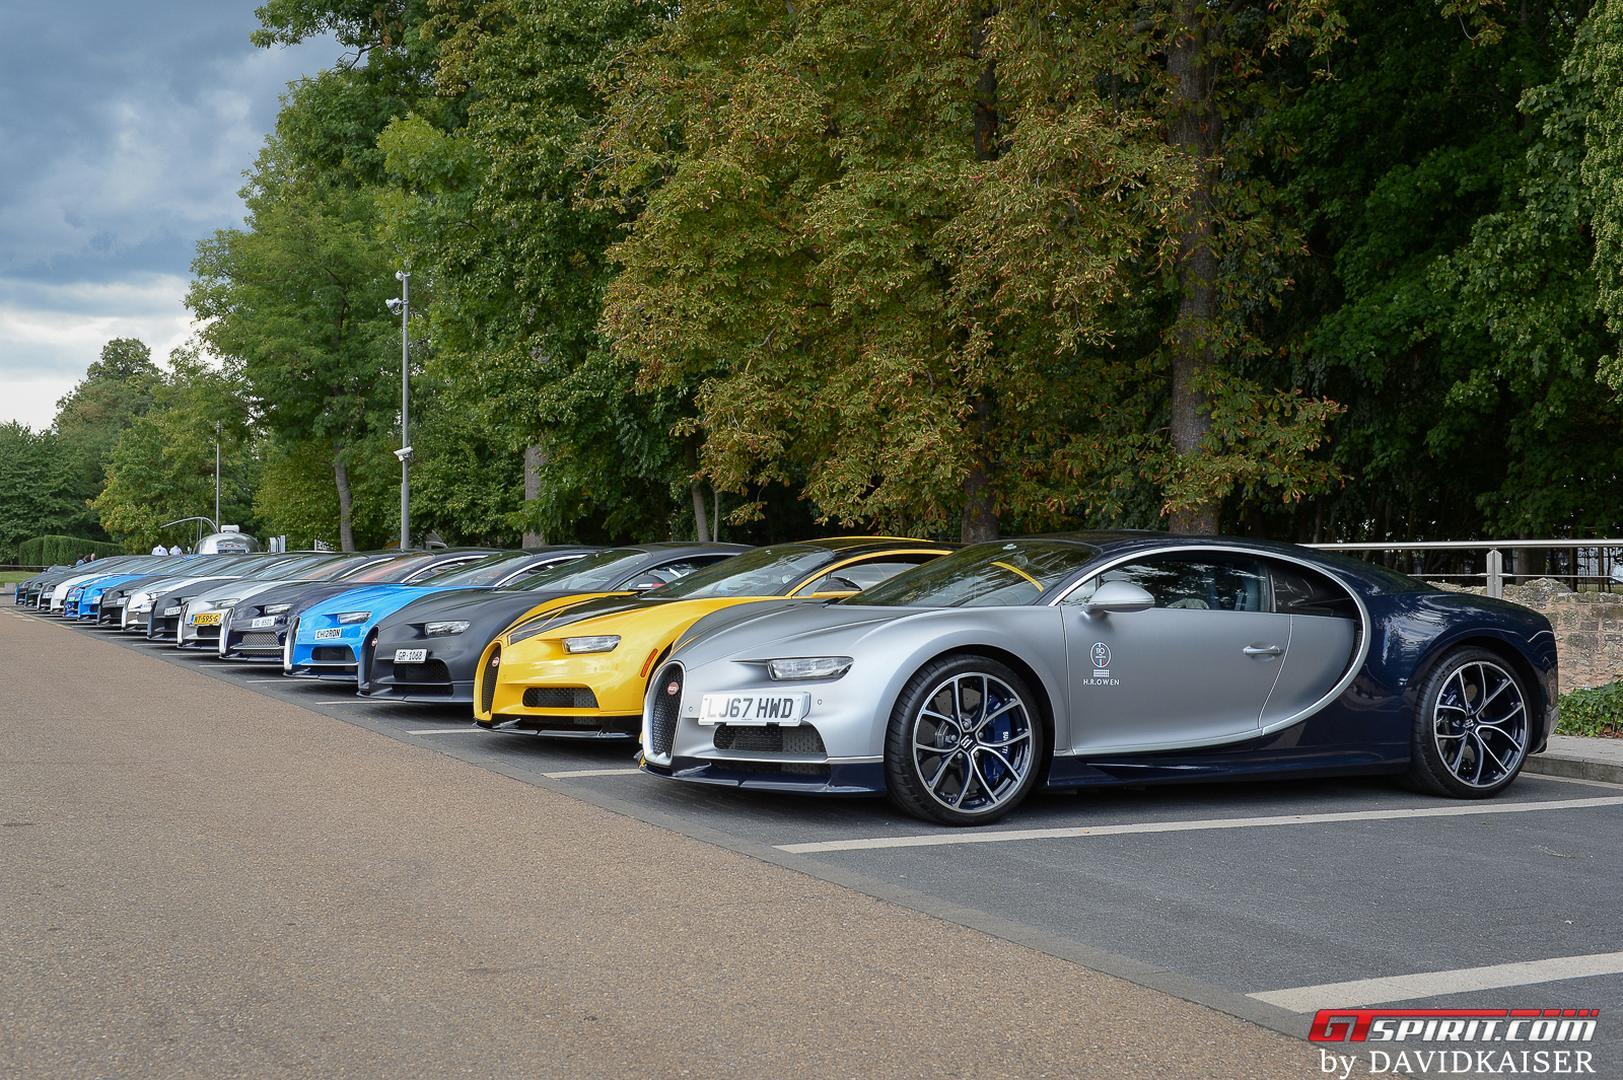 Flashback to the Grande Fête Bugatti 110th anniversary in Molsheim